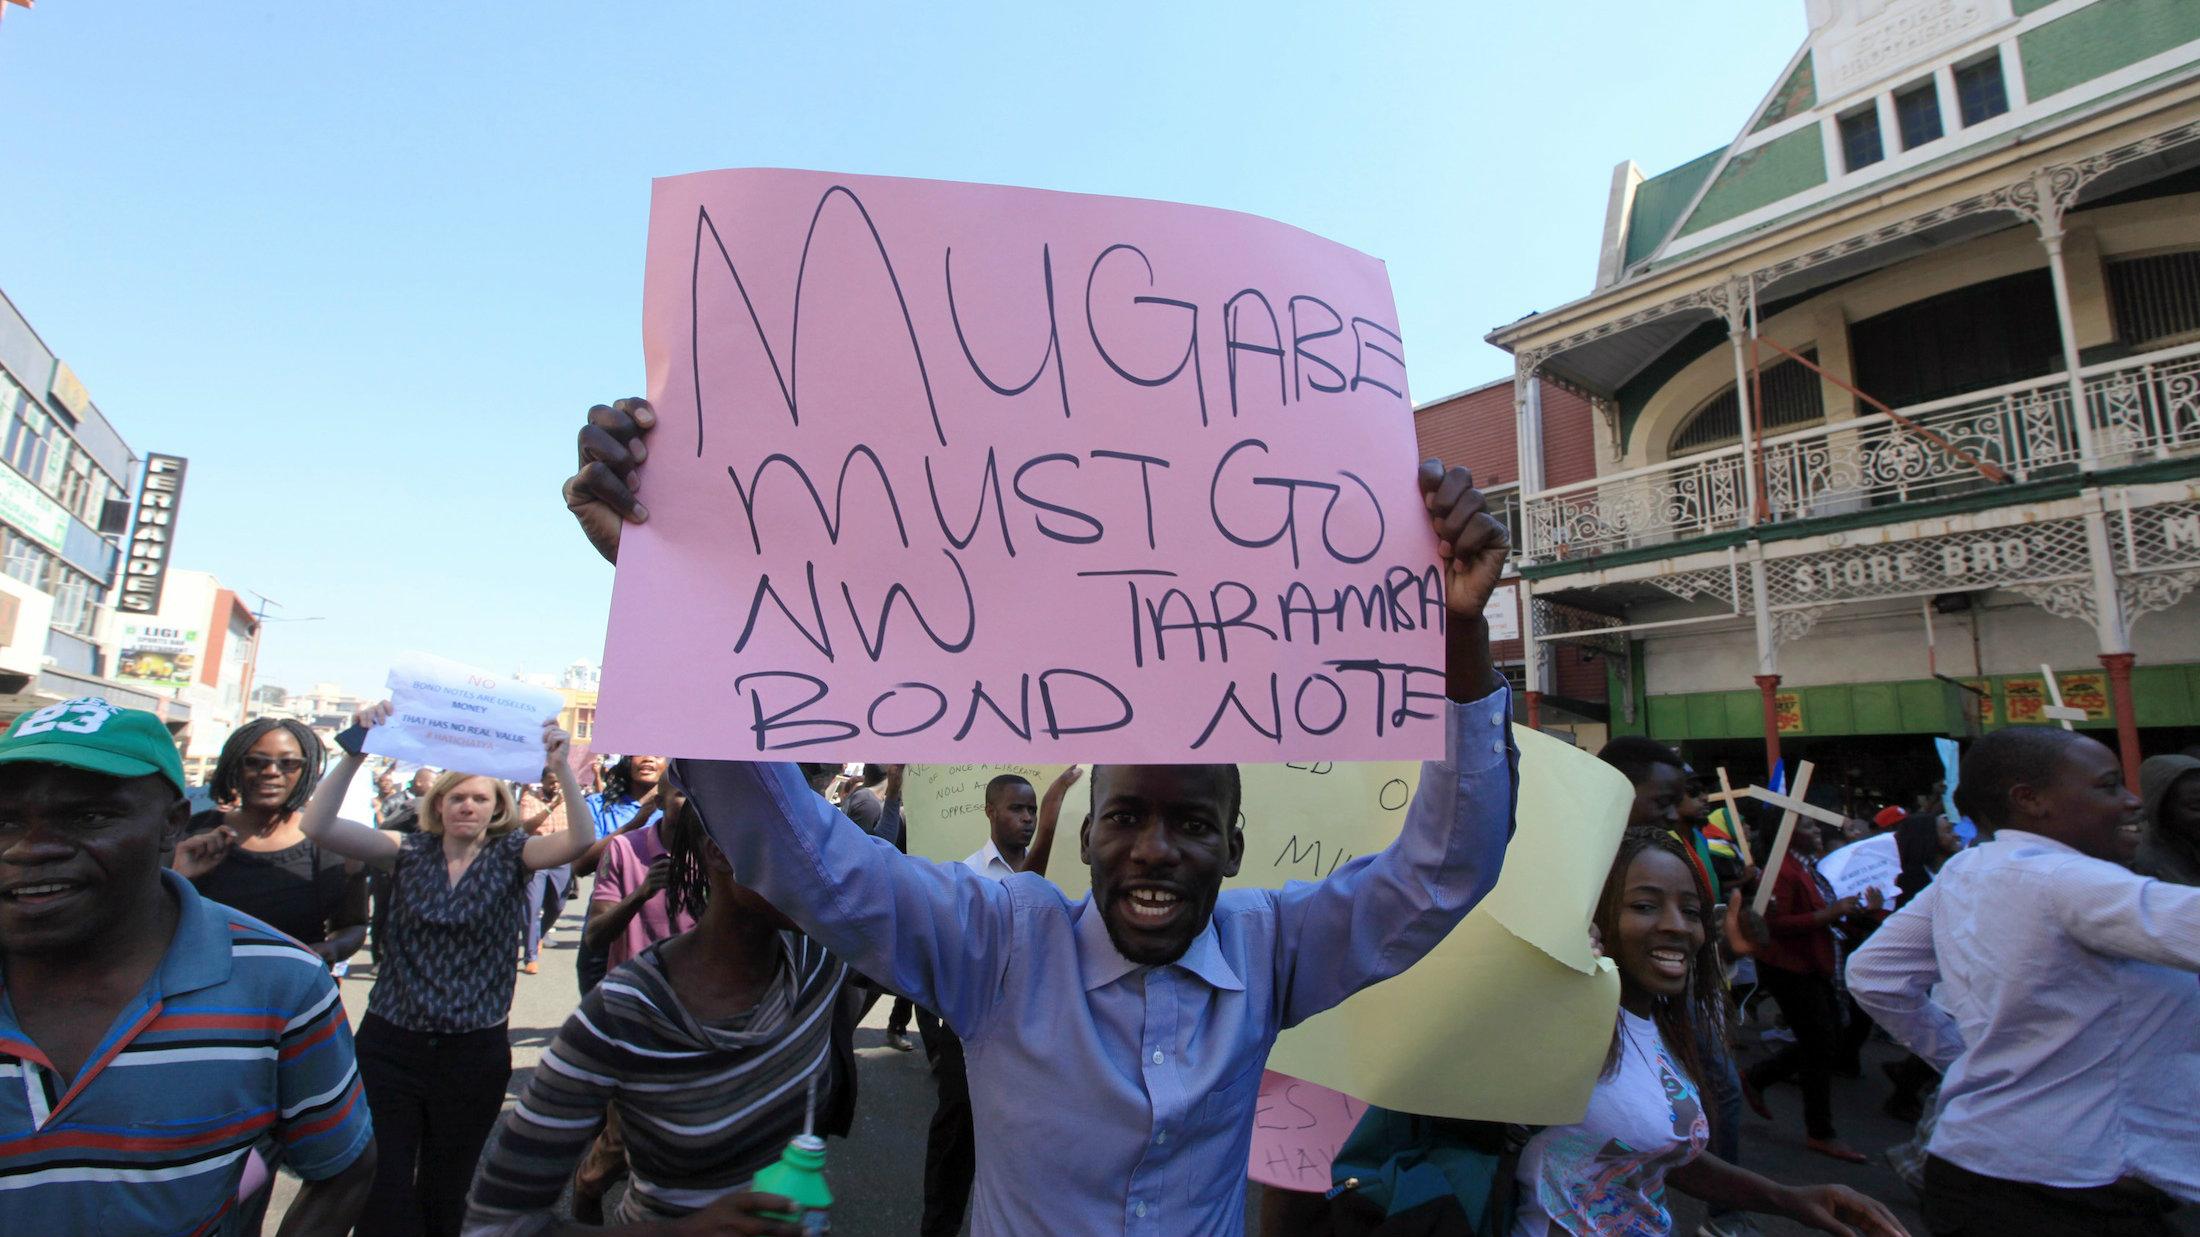 Mugabe must go, poster